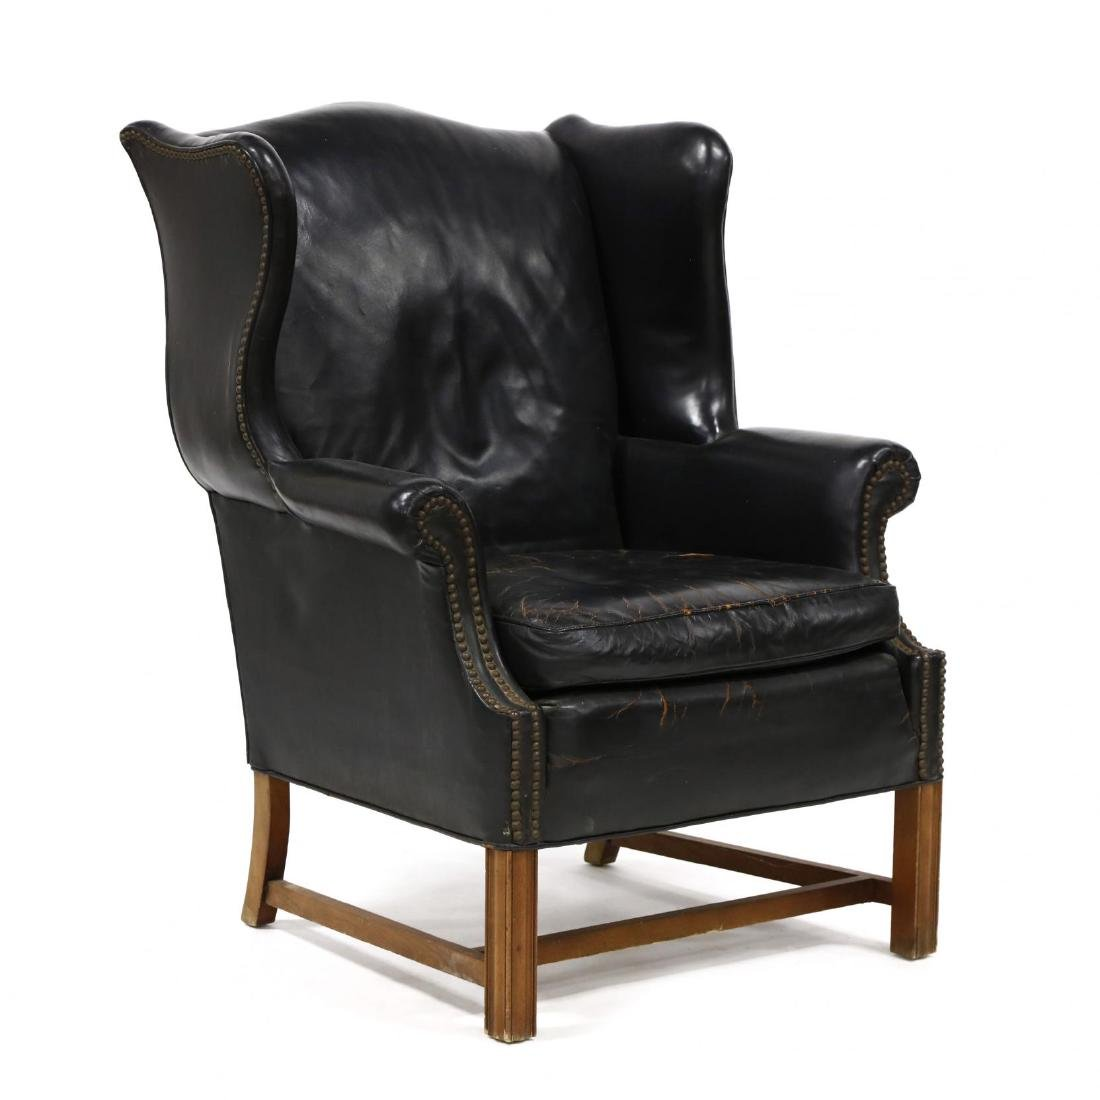 Century Furniture, Vintage Leather Upholstered